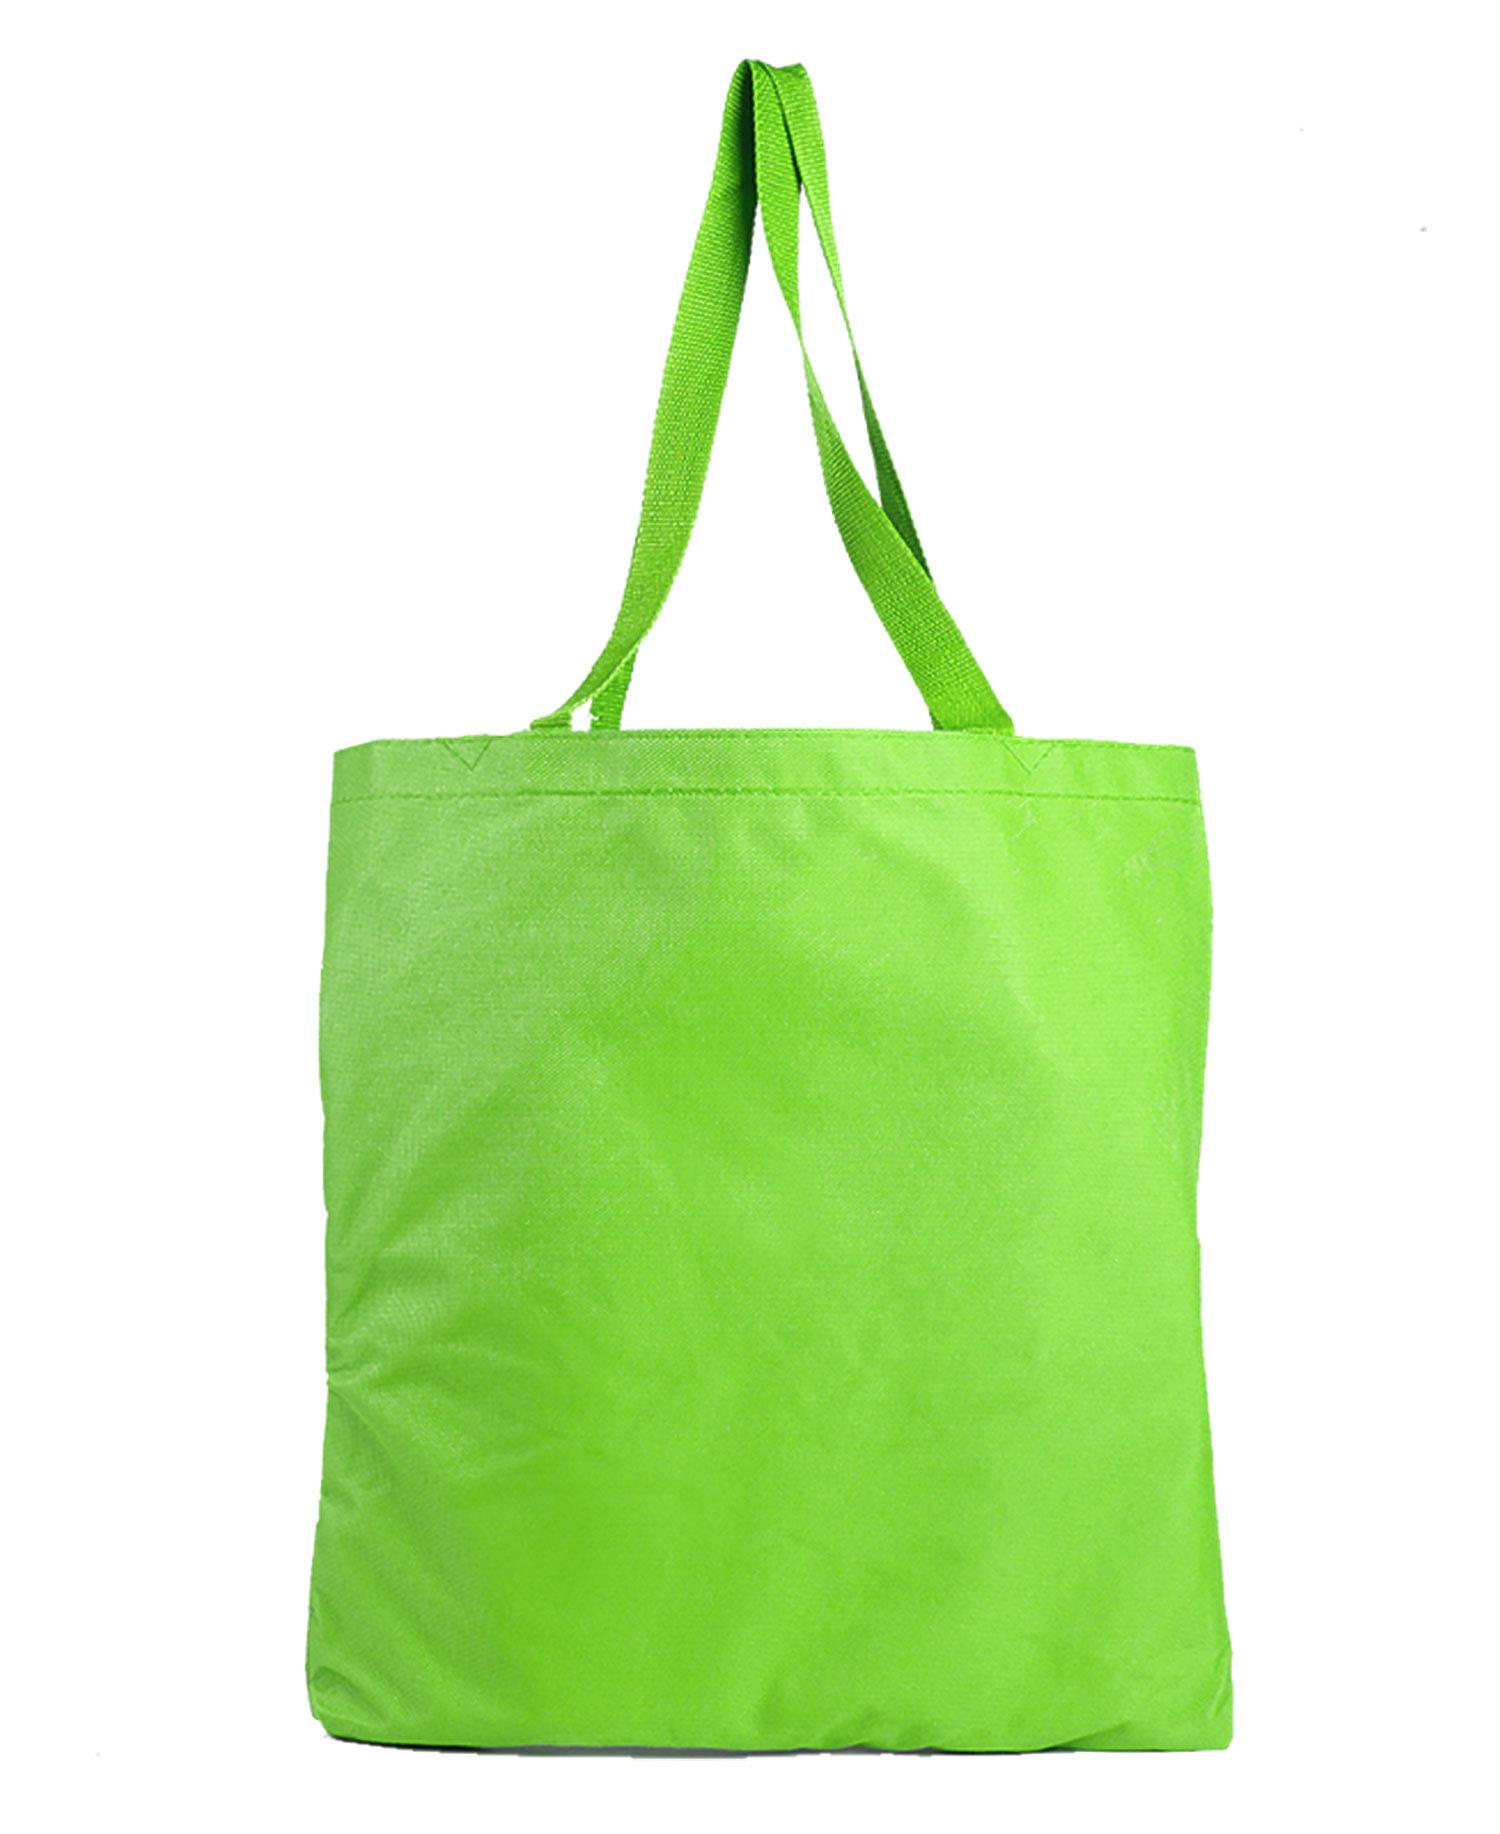 Q Tees Q91284 Polyester Tote Bag